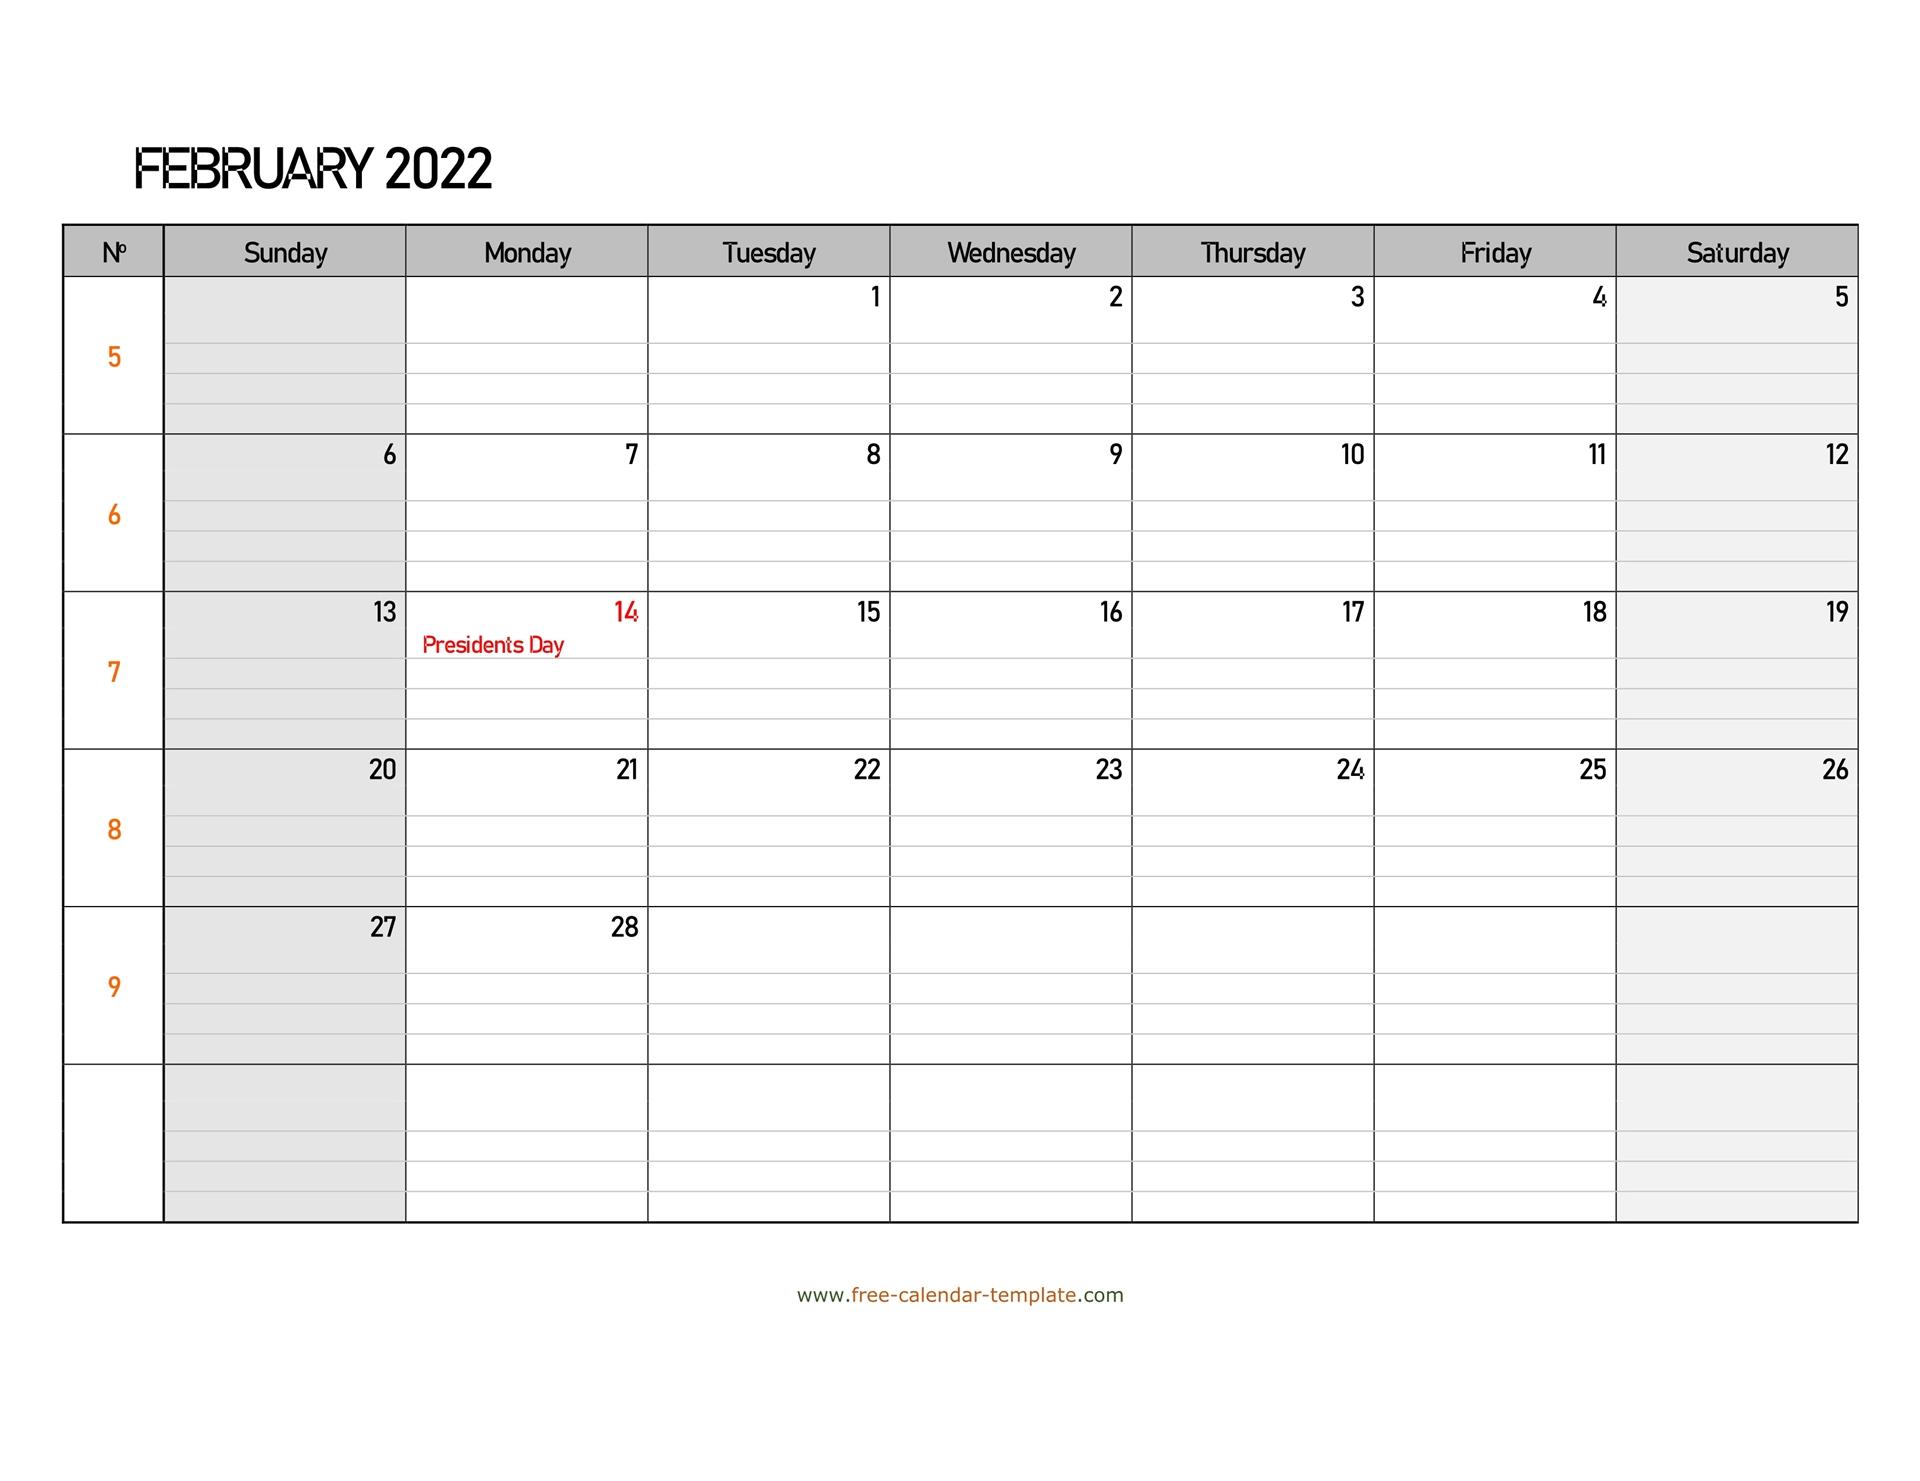 February 2022 Calendar Free Printable With Grid Lines Intended For Printable February 2022 Calendar